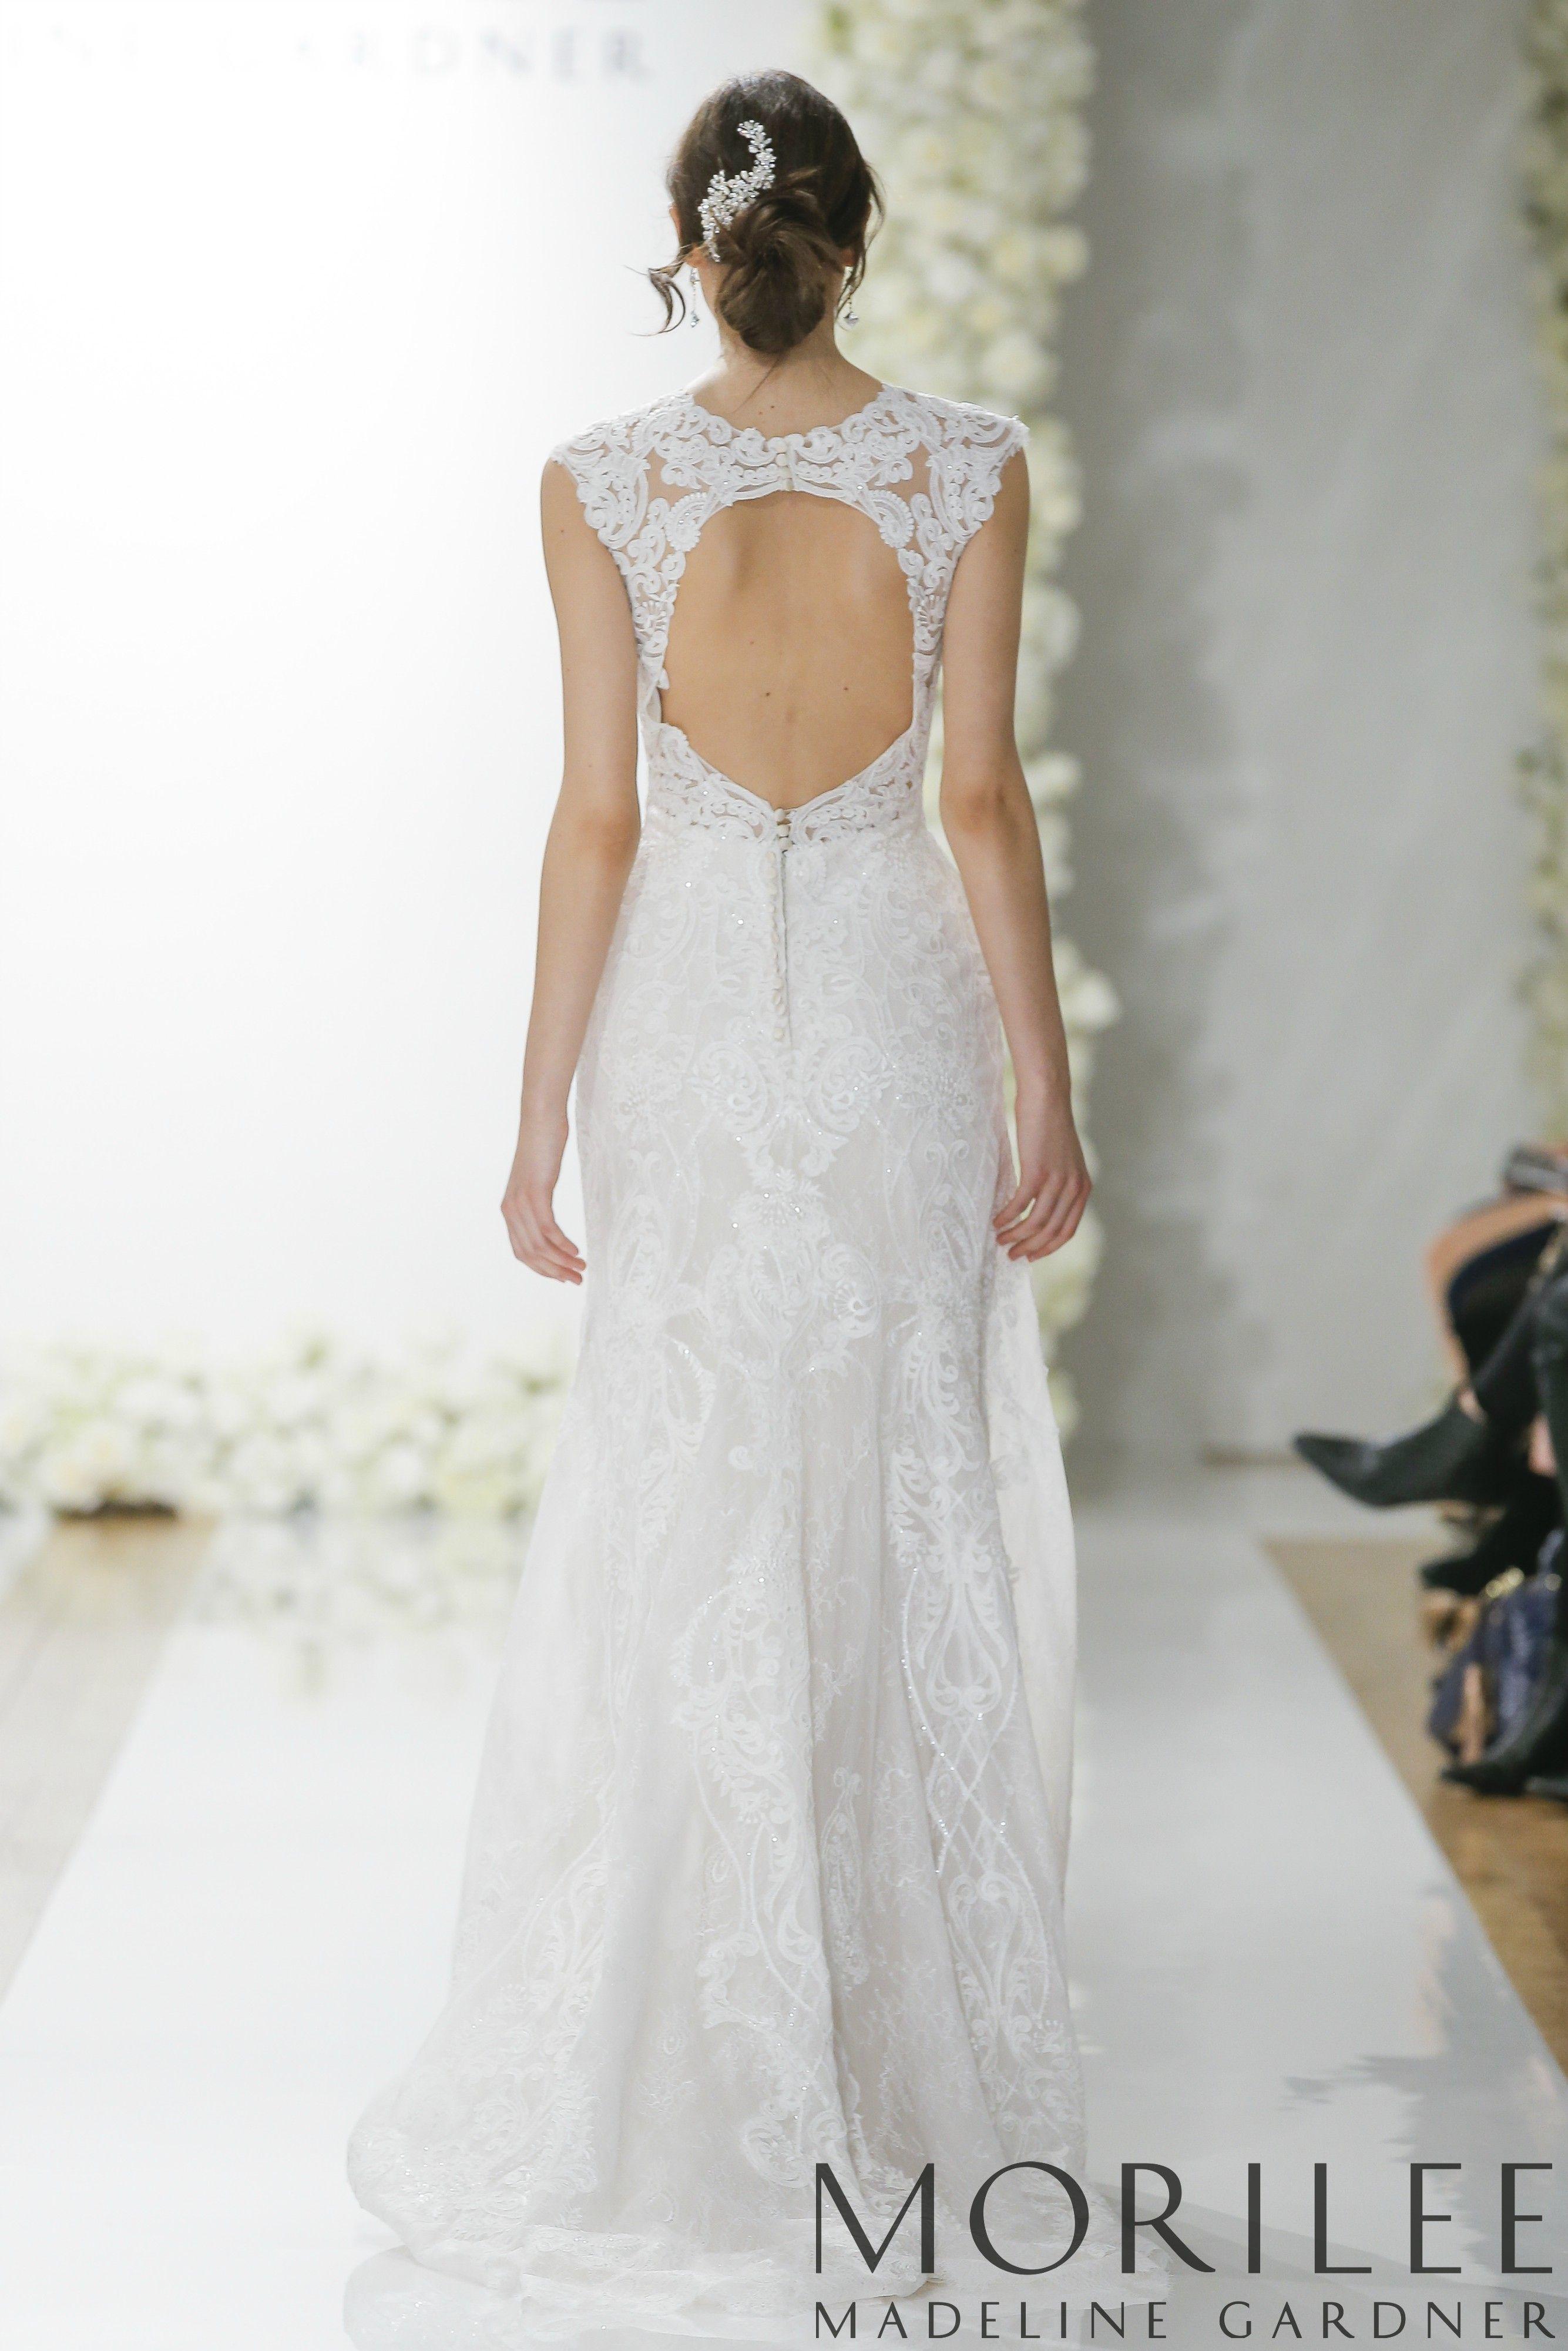 5a0f84da Morilee | Madeline Gardner, Lynette Style 8288 | Vintage Inpired Wedding  Dress Featuring Frosted,